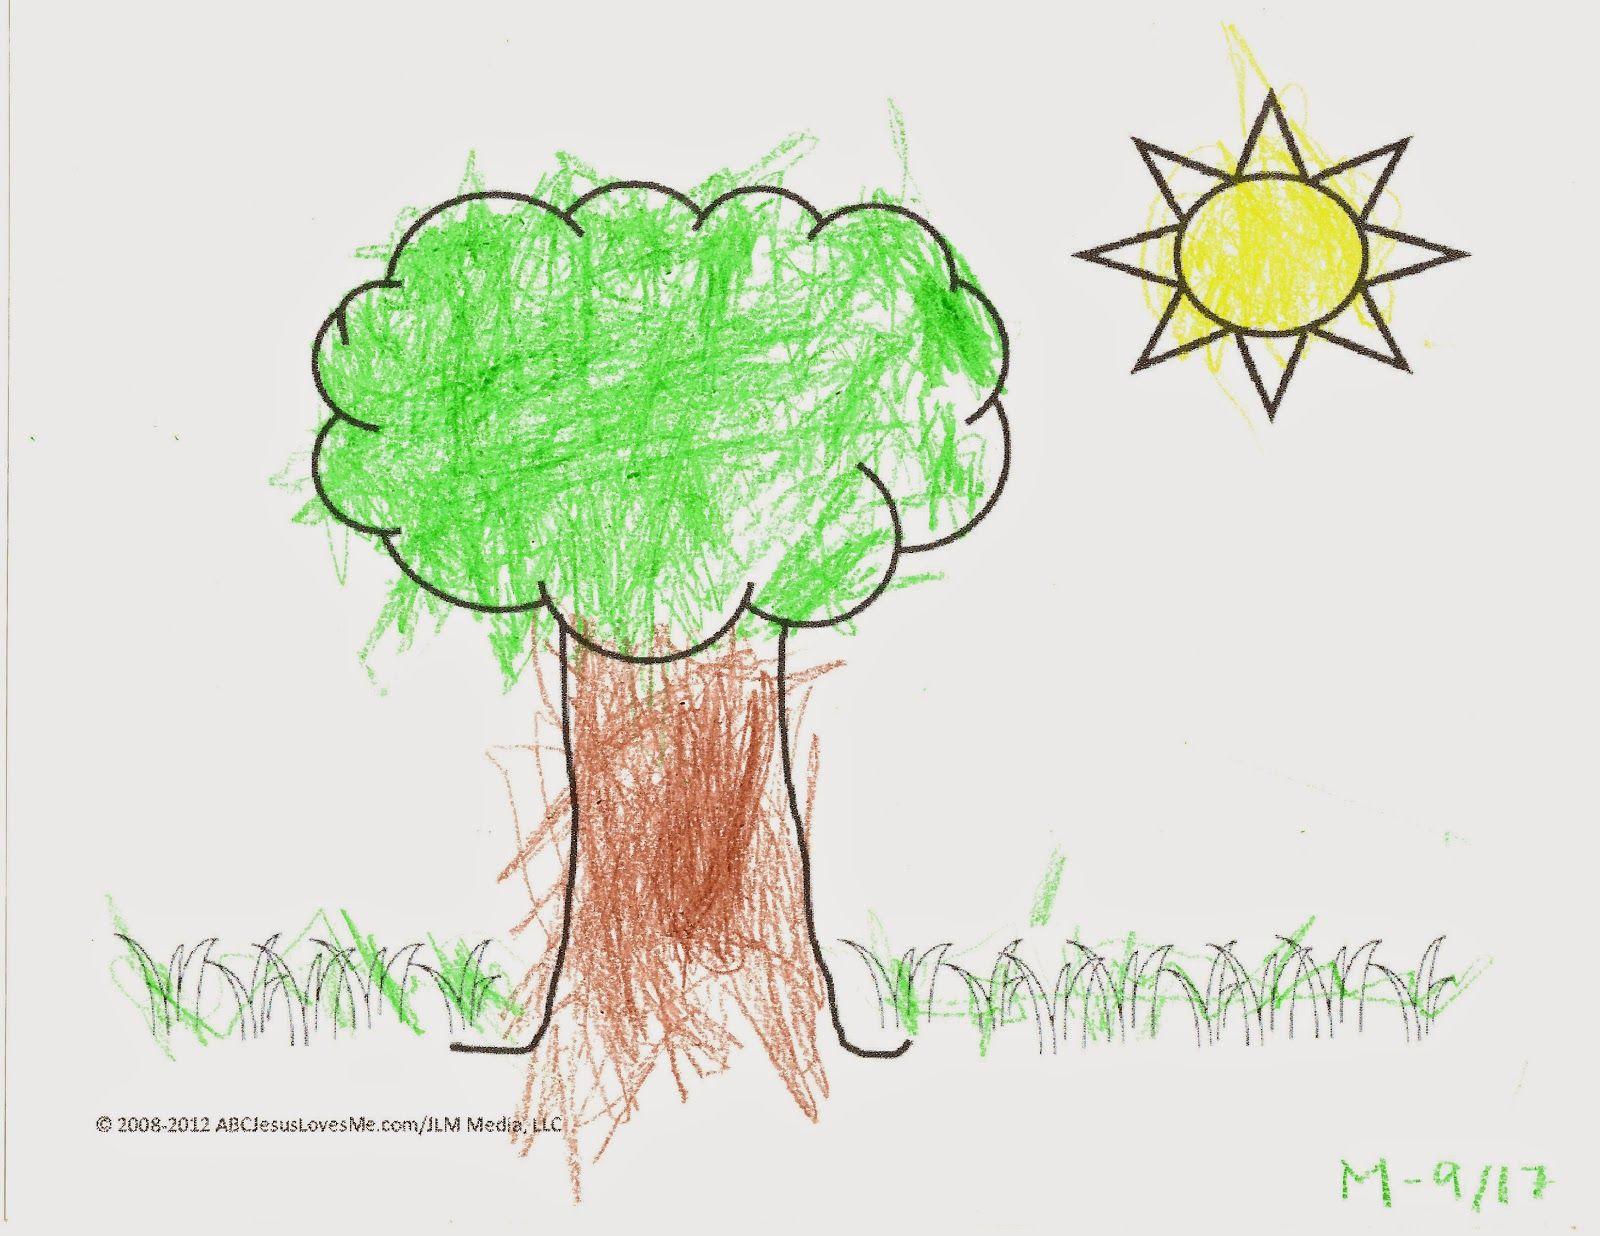 Coloring sheets and creativity kidus stuff pinterest kids s